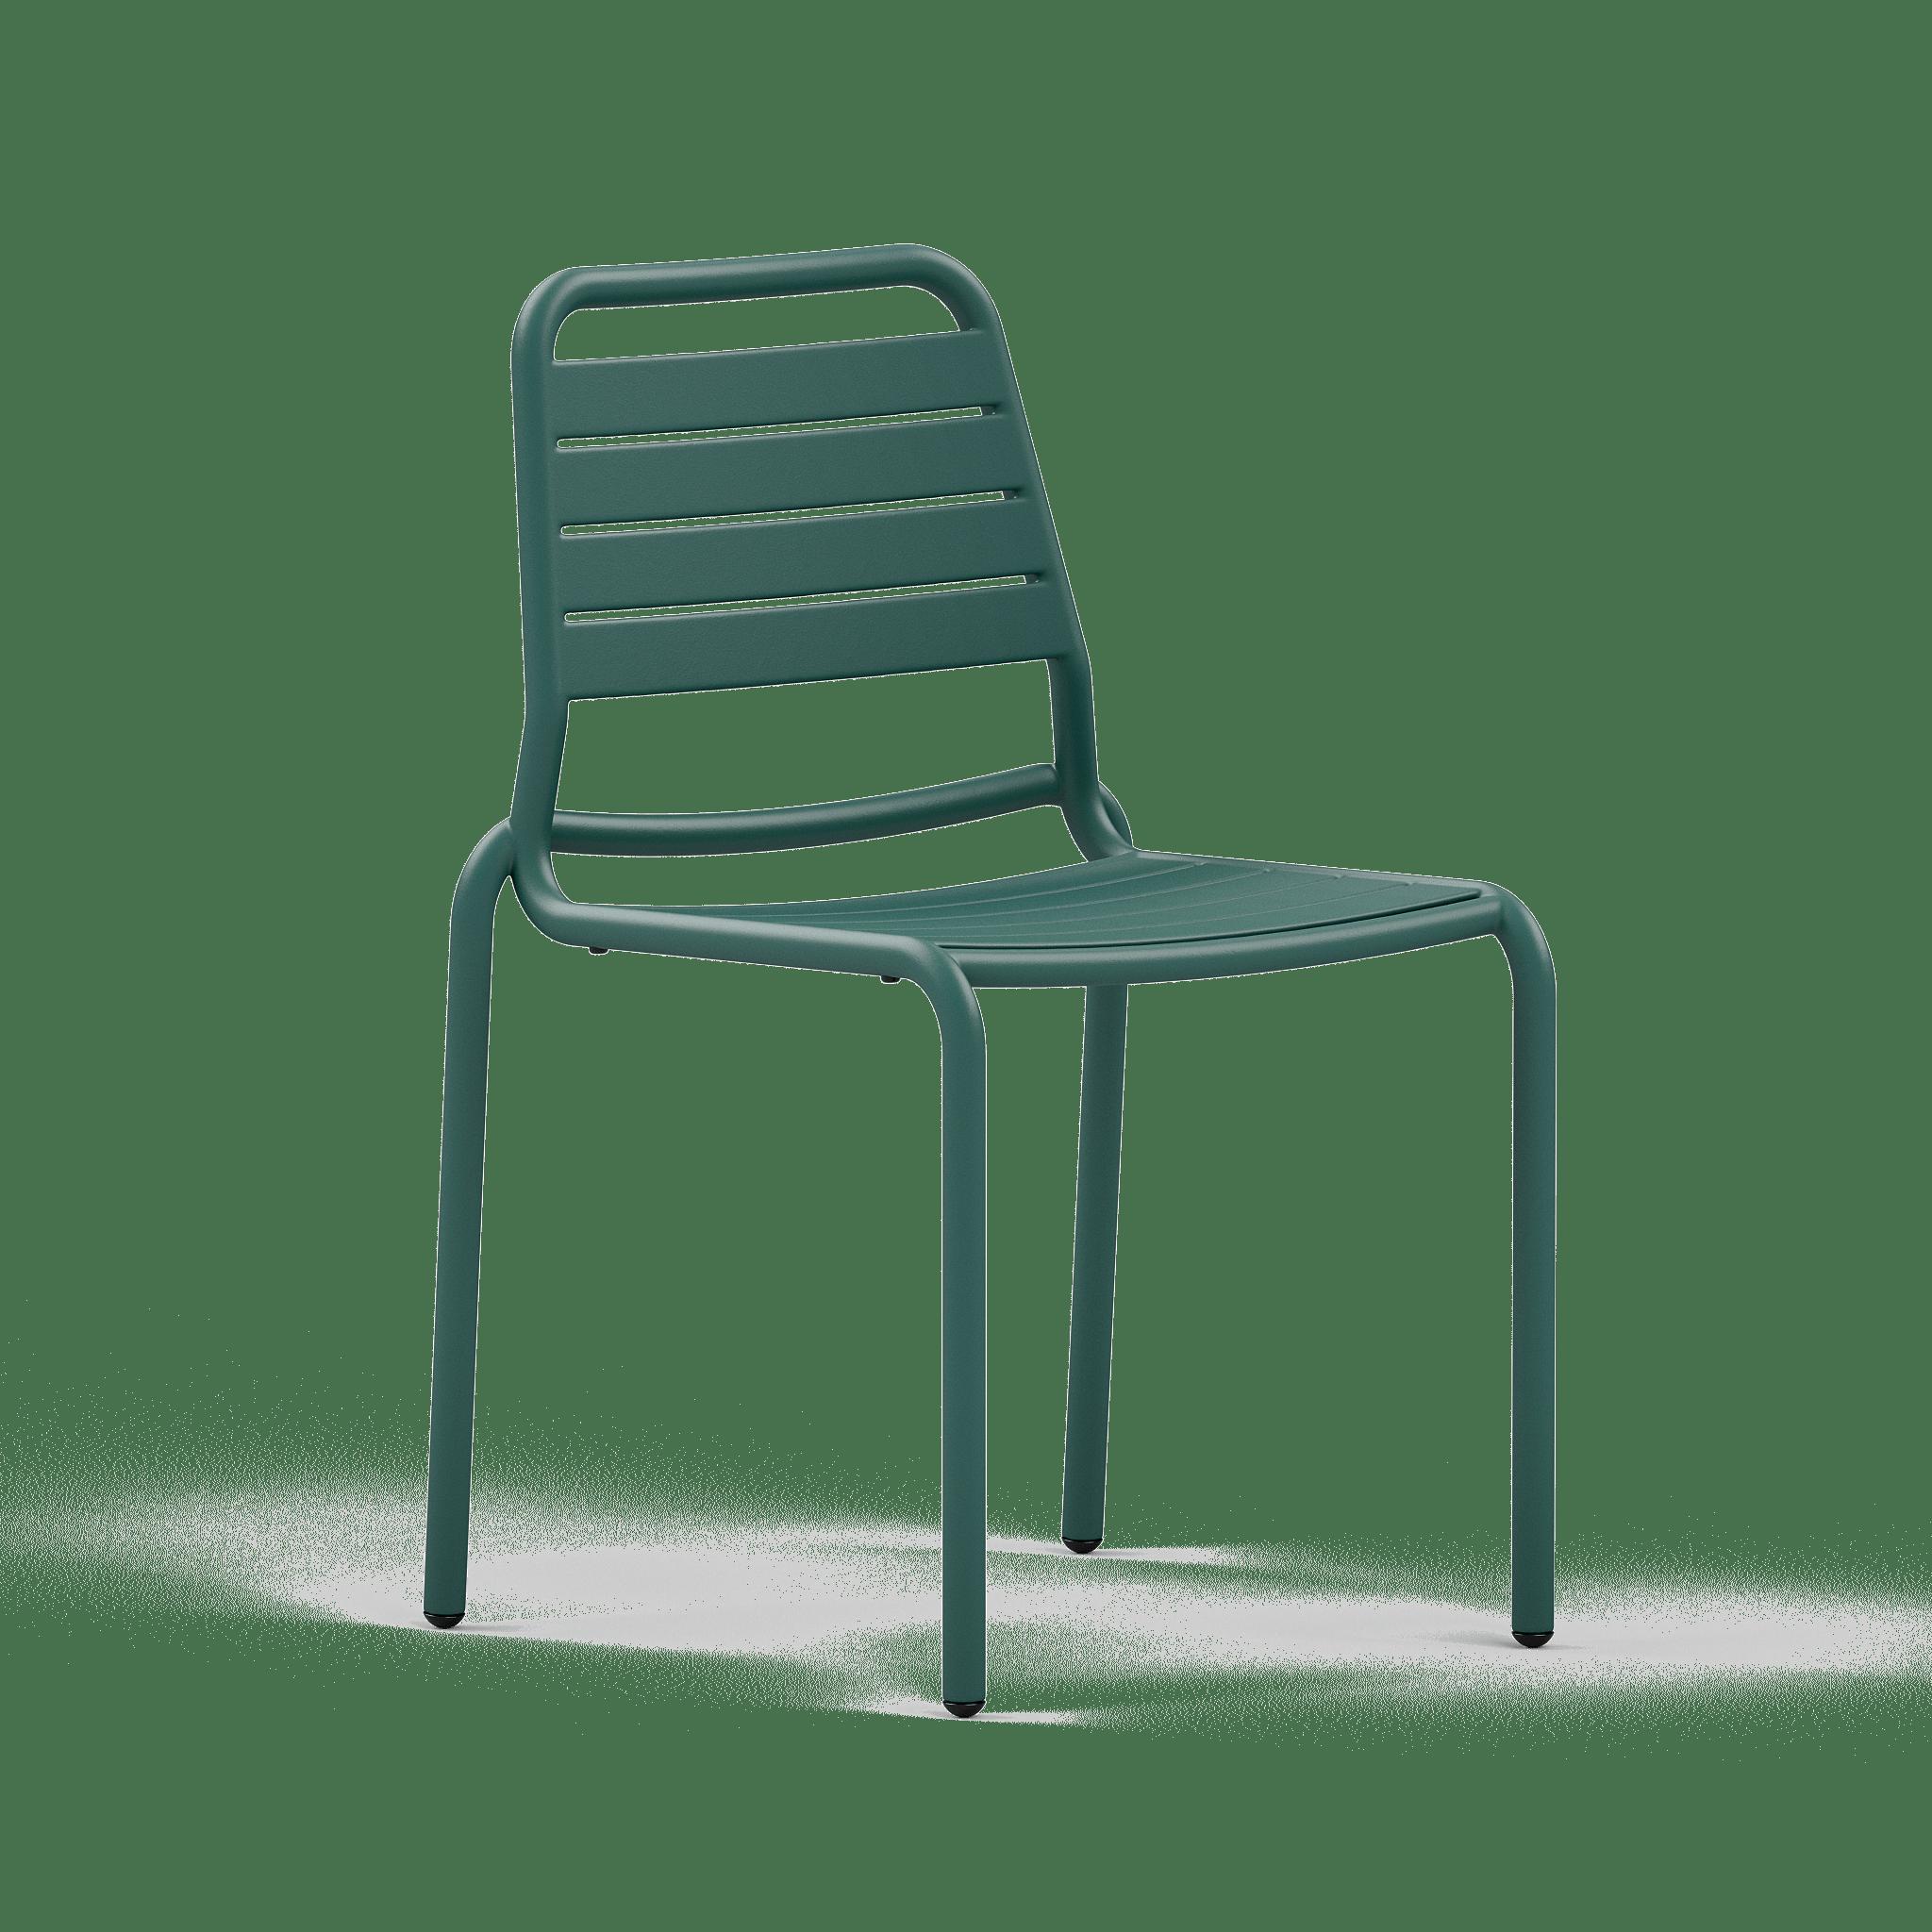 The Floyd Outdoor Chair